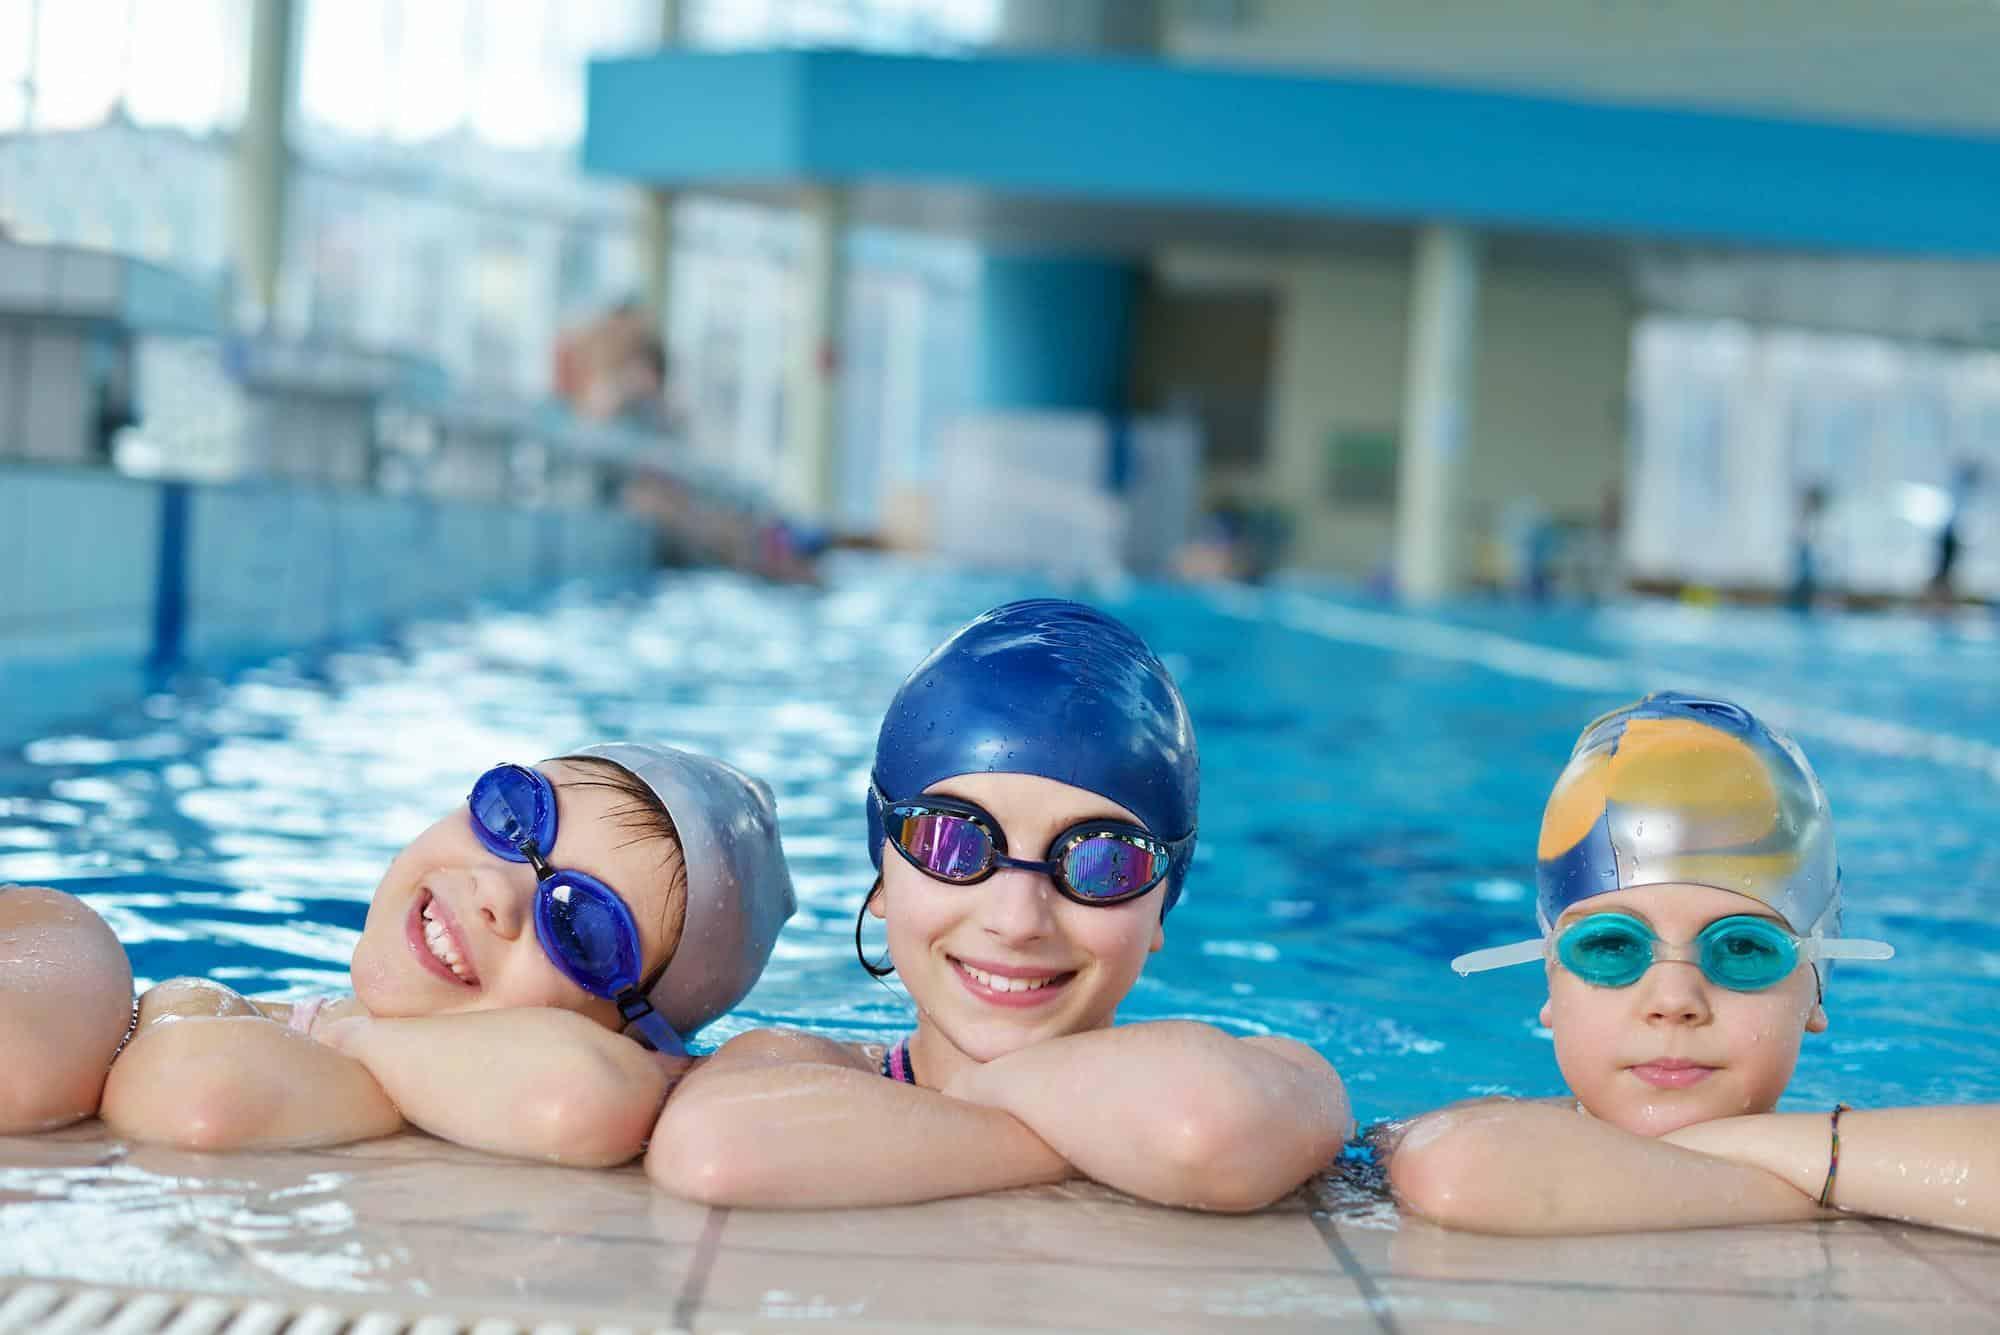 Kids with swim goggles